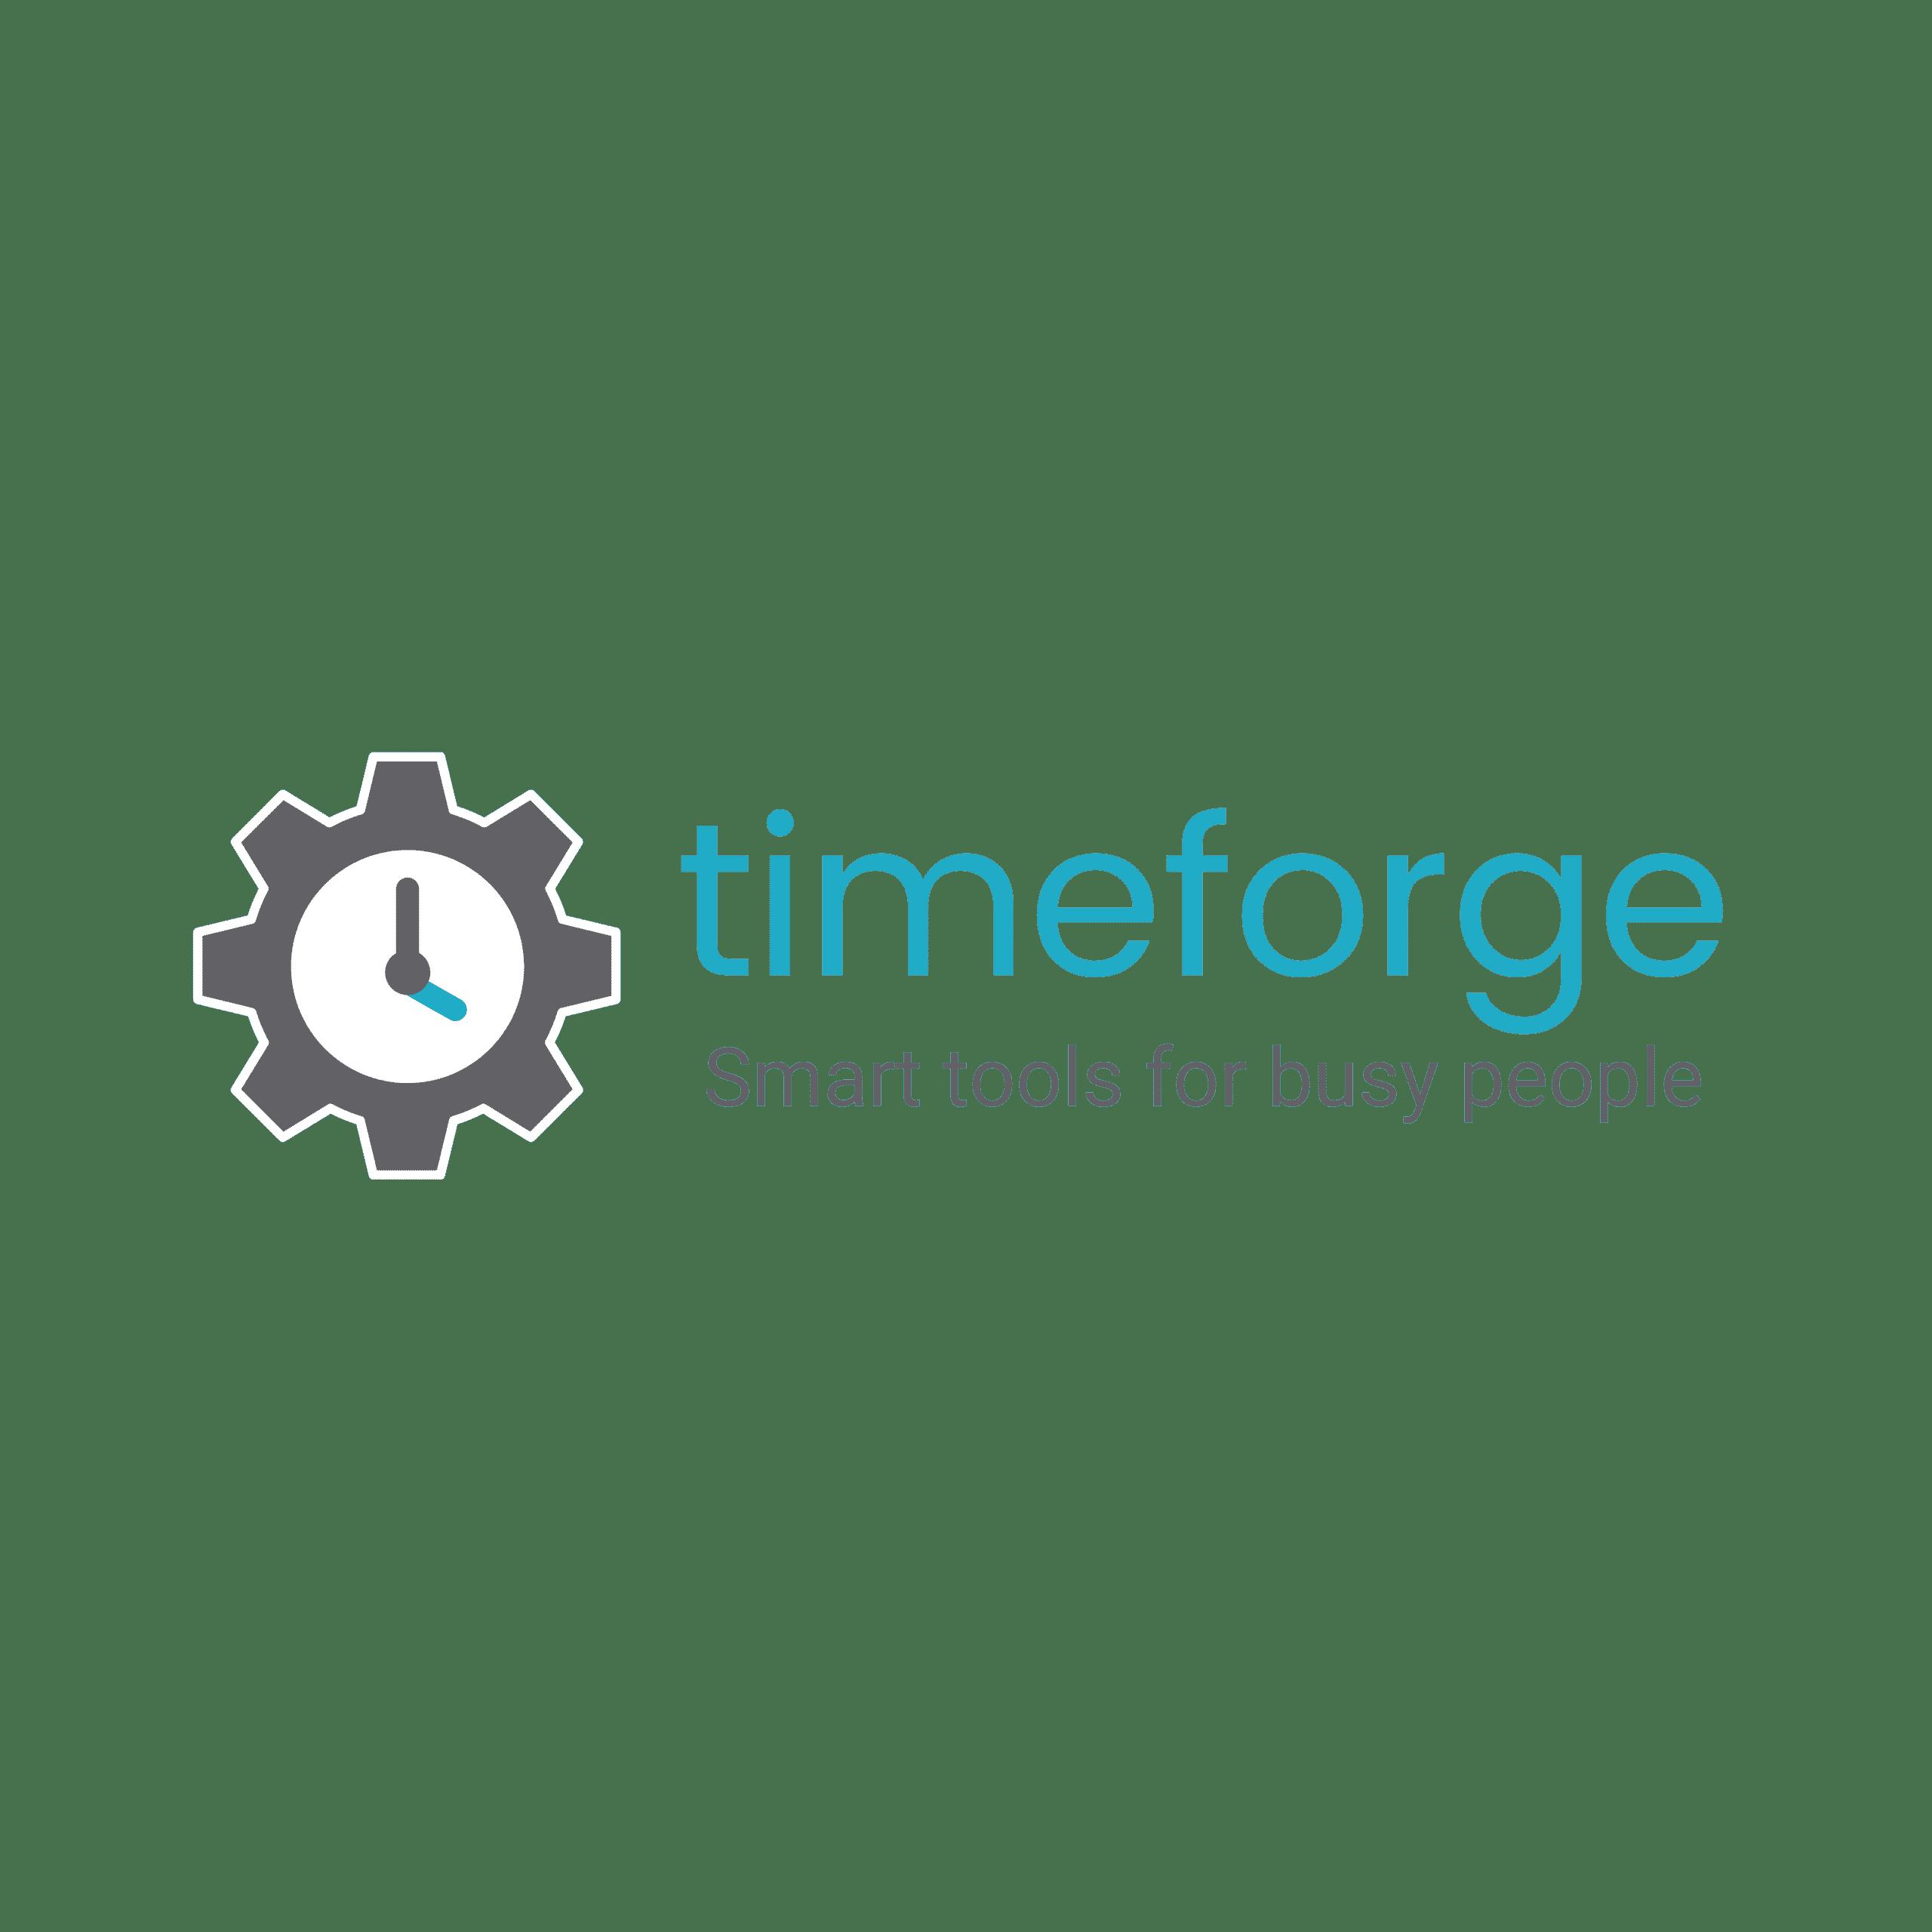 TimeForge company logo